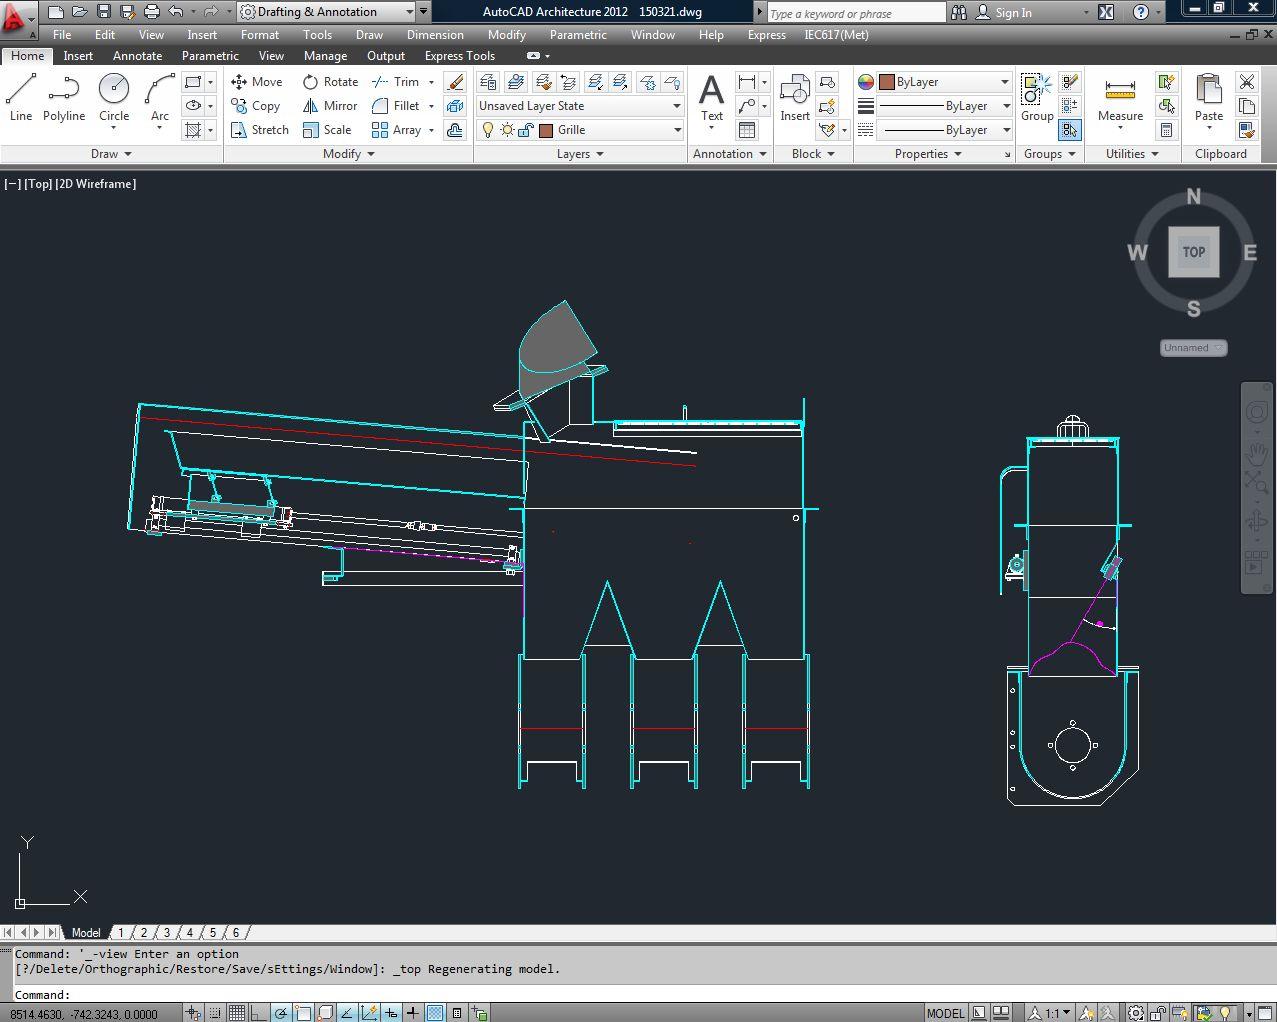 autocad civil 3d software para engenharia civil autodesk autos post. Black Bedroom Furniture Sets. Home Design Ideas